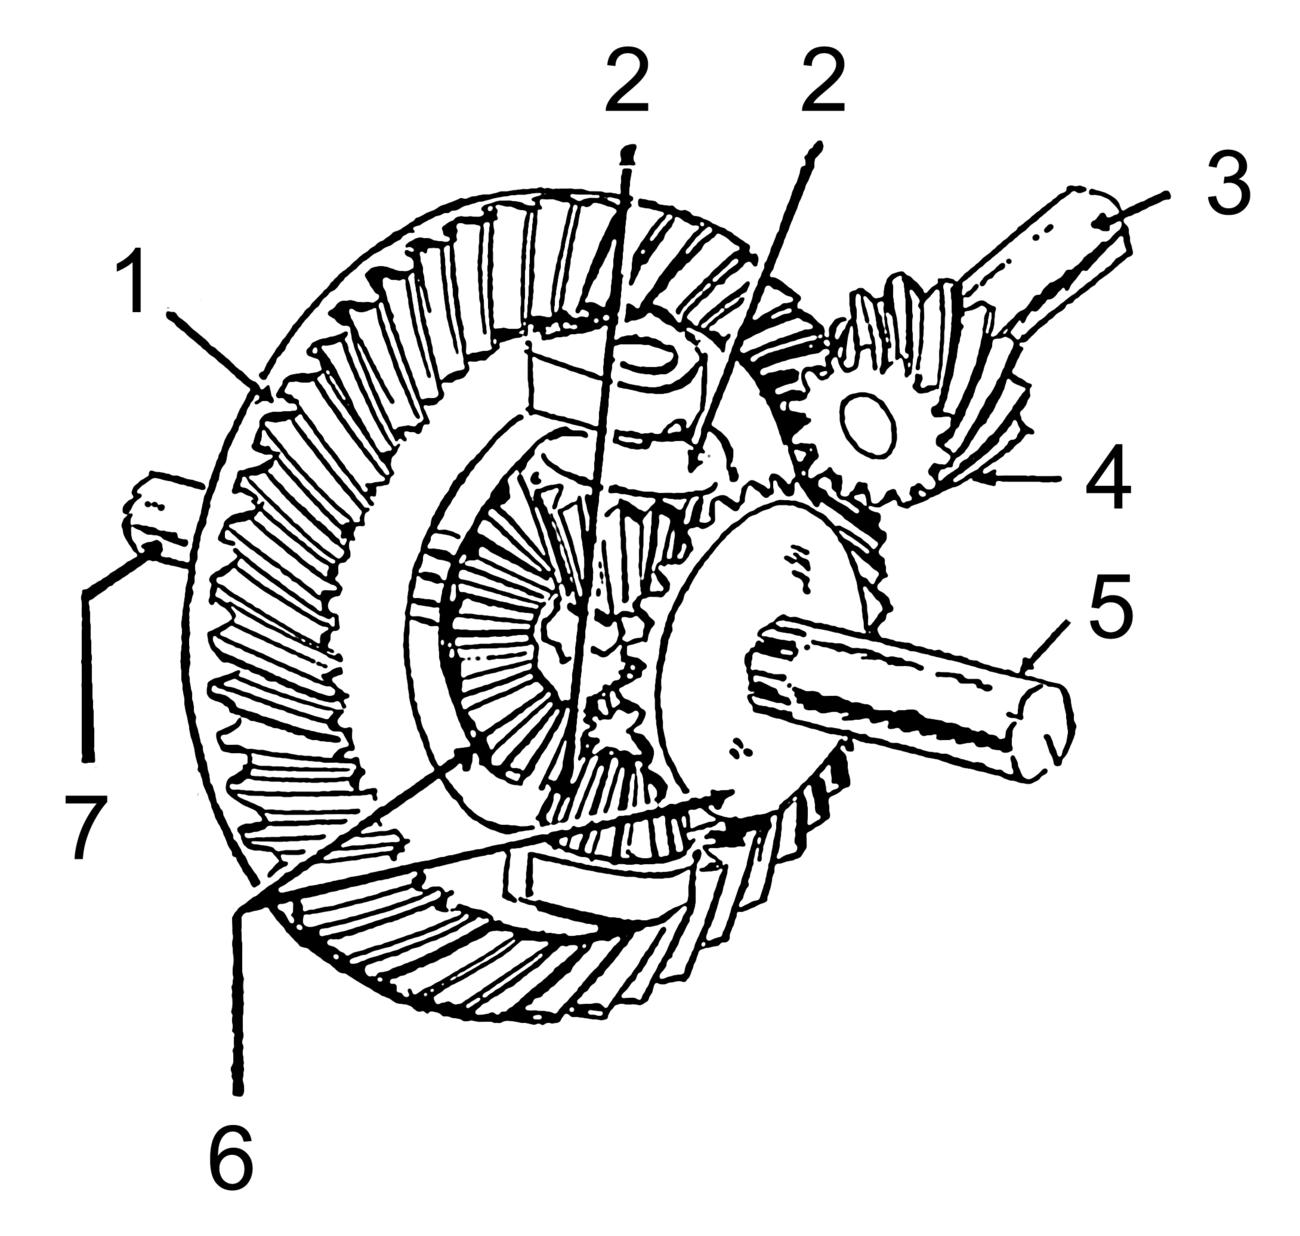 zdroj: commons.wikimedia.org